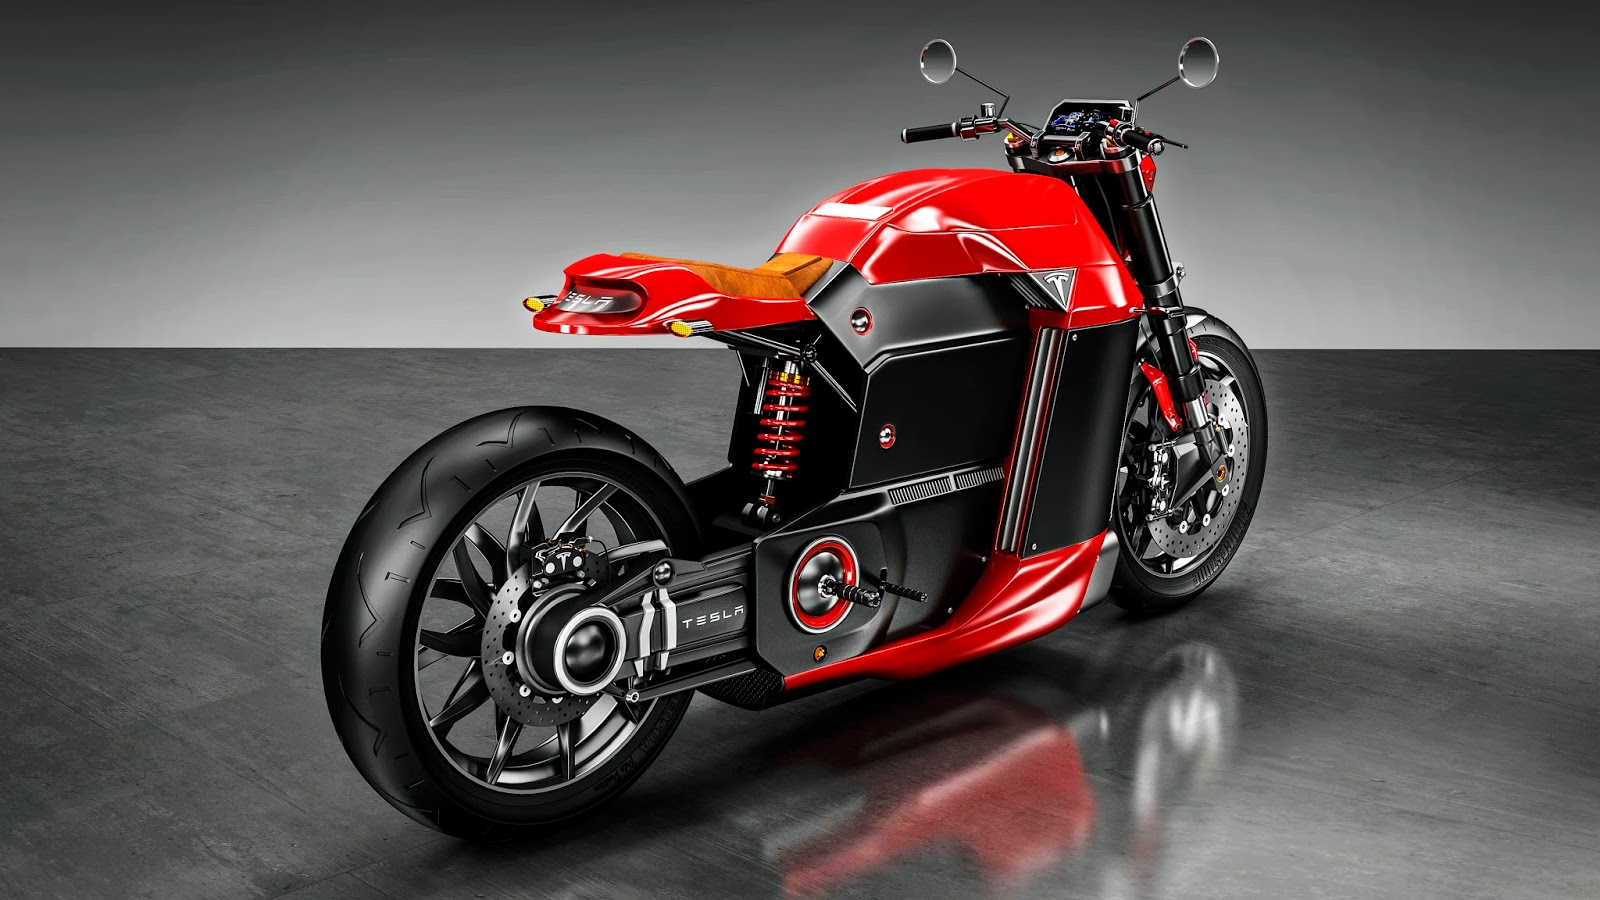 tesla-motorcycle-03.jpg